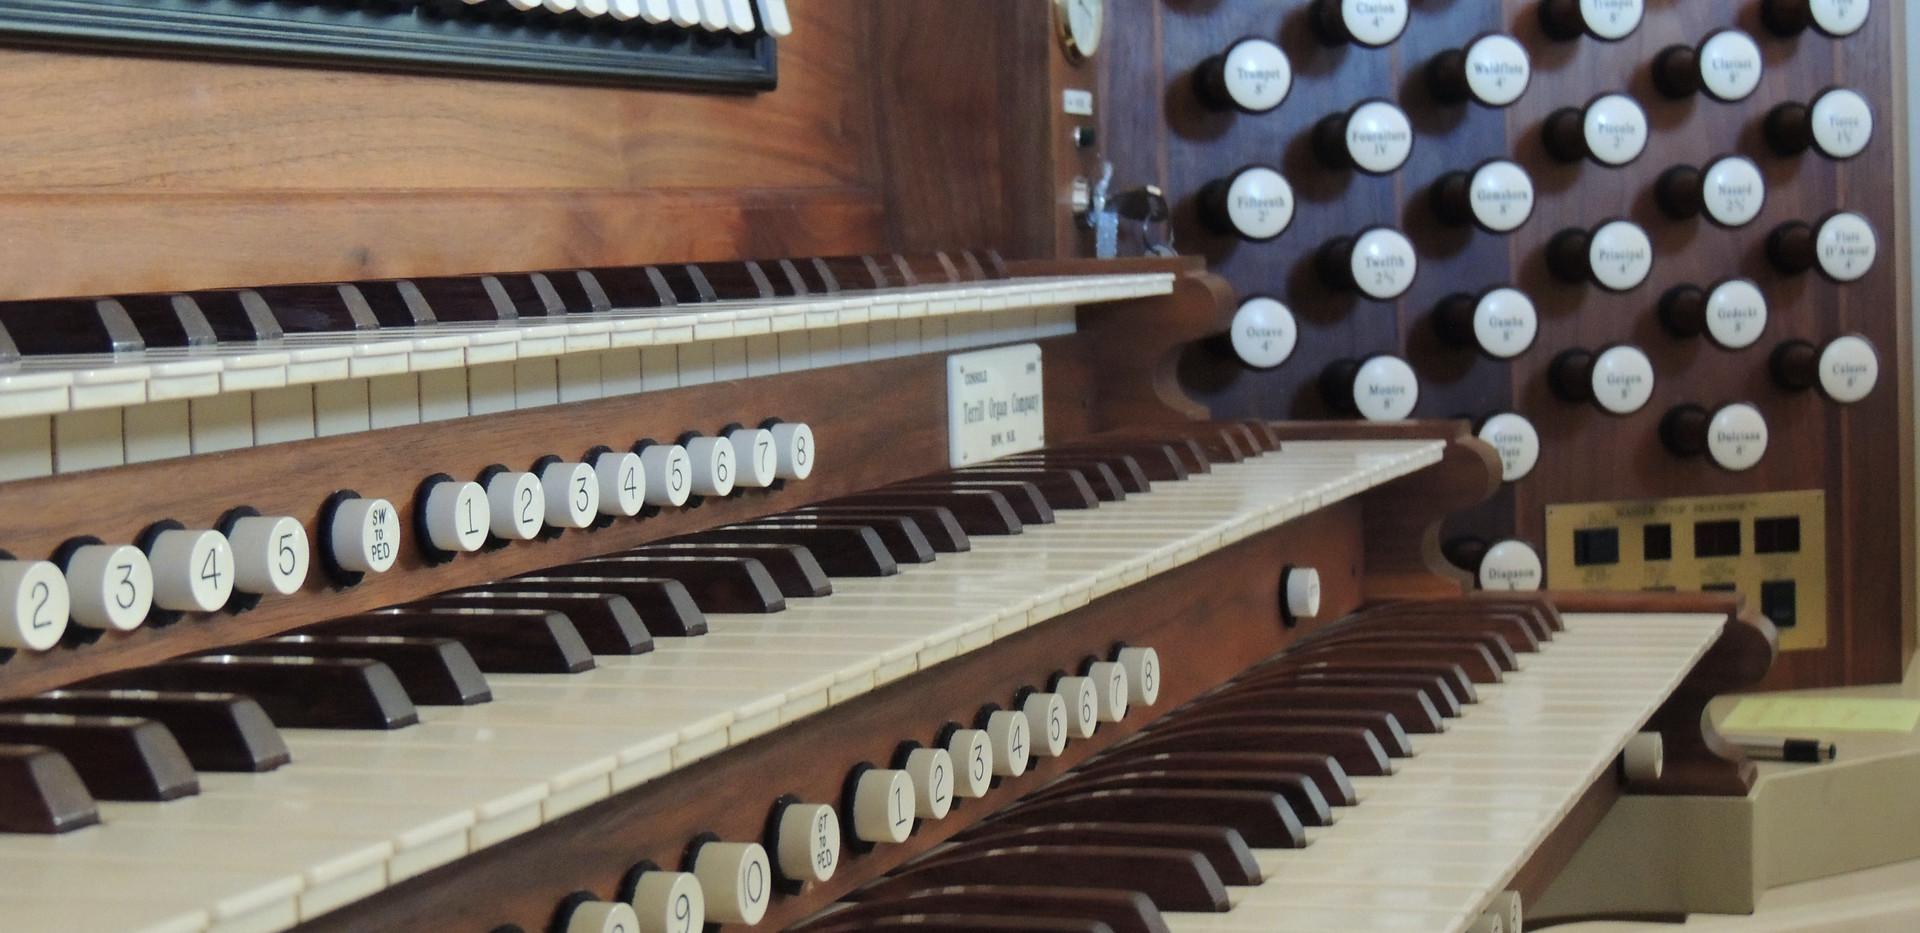 chapeloorgan-keyboard-stop1.jpeg